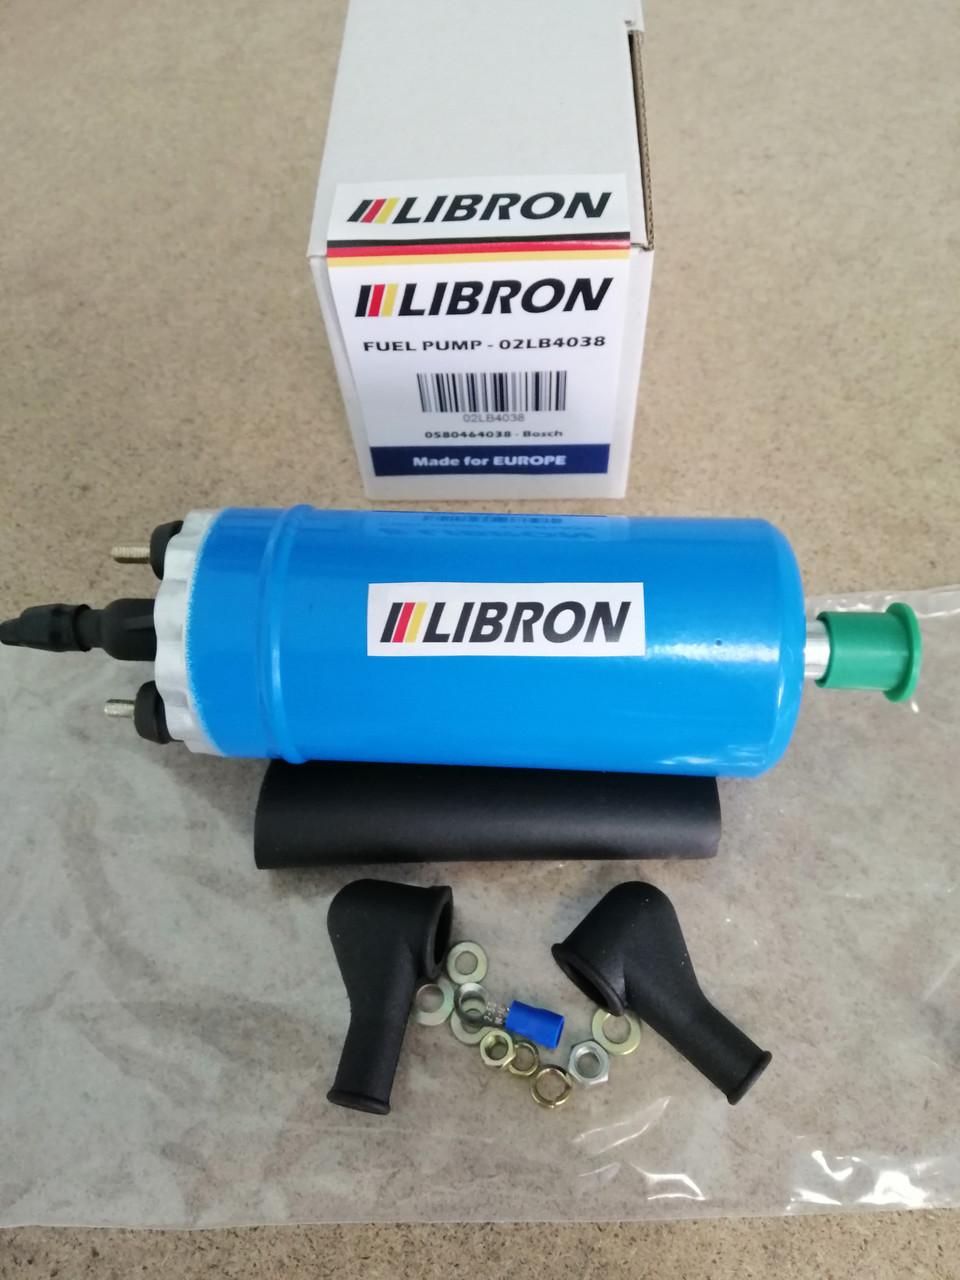 Бензонасос LIBRON 02LB4038 - PEUGEOT 405 I Break (15E) 1.9 (1988-1992)